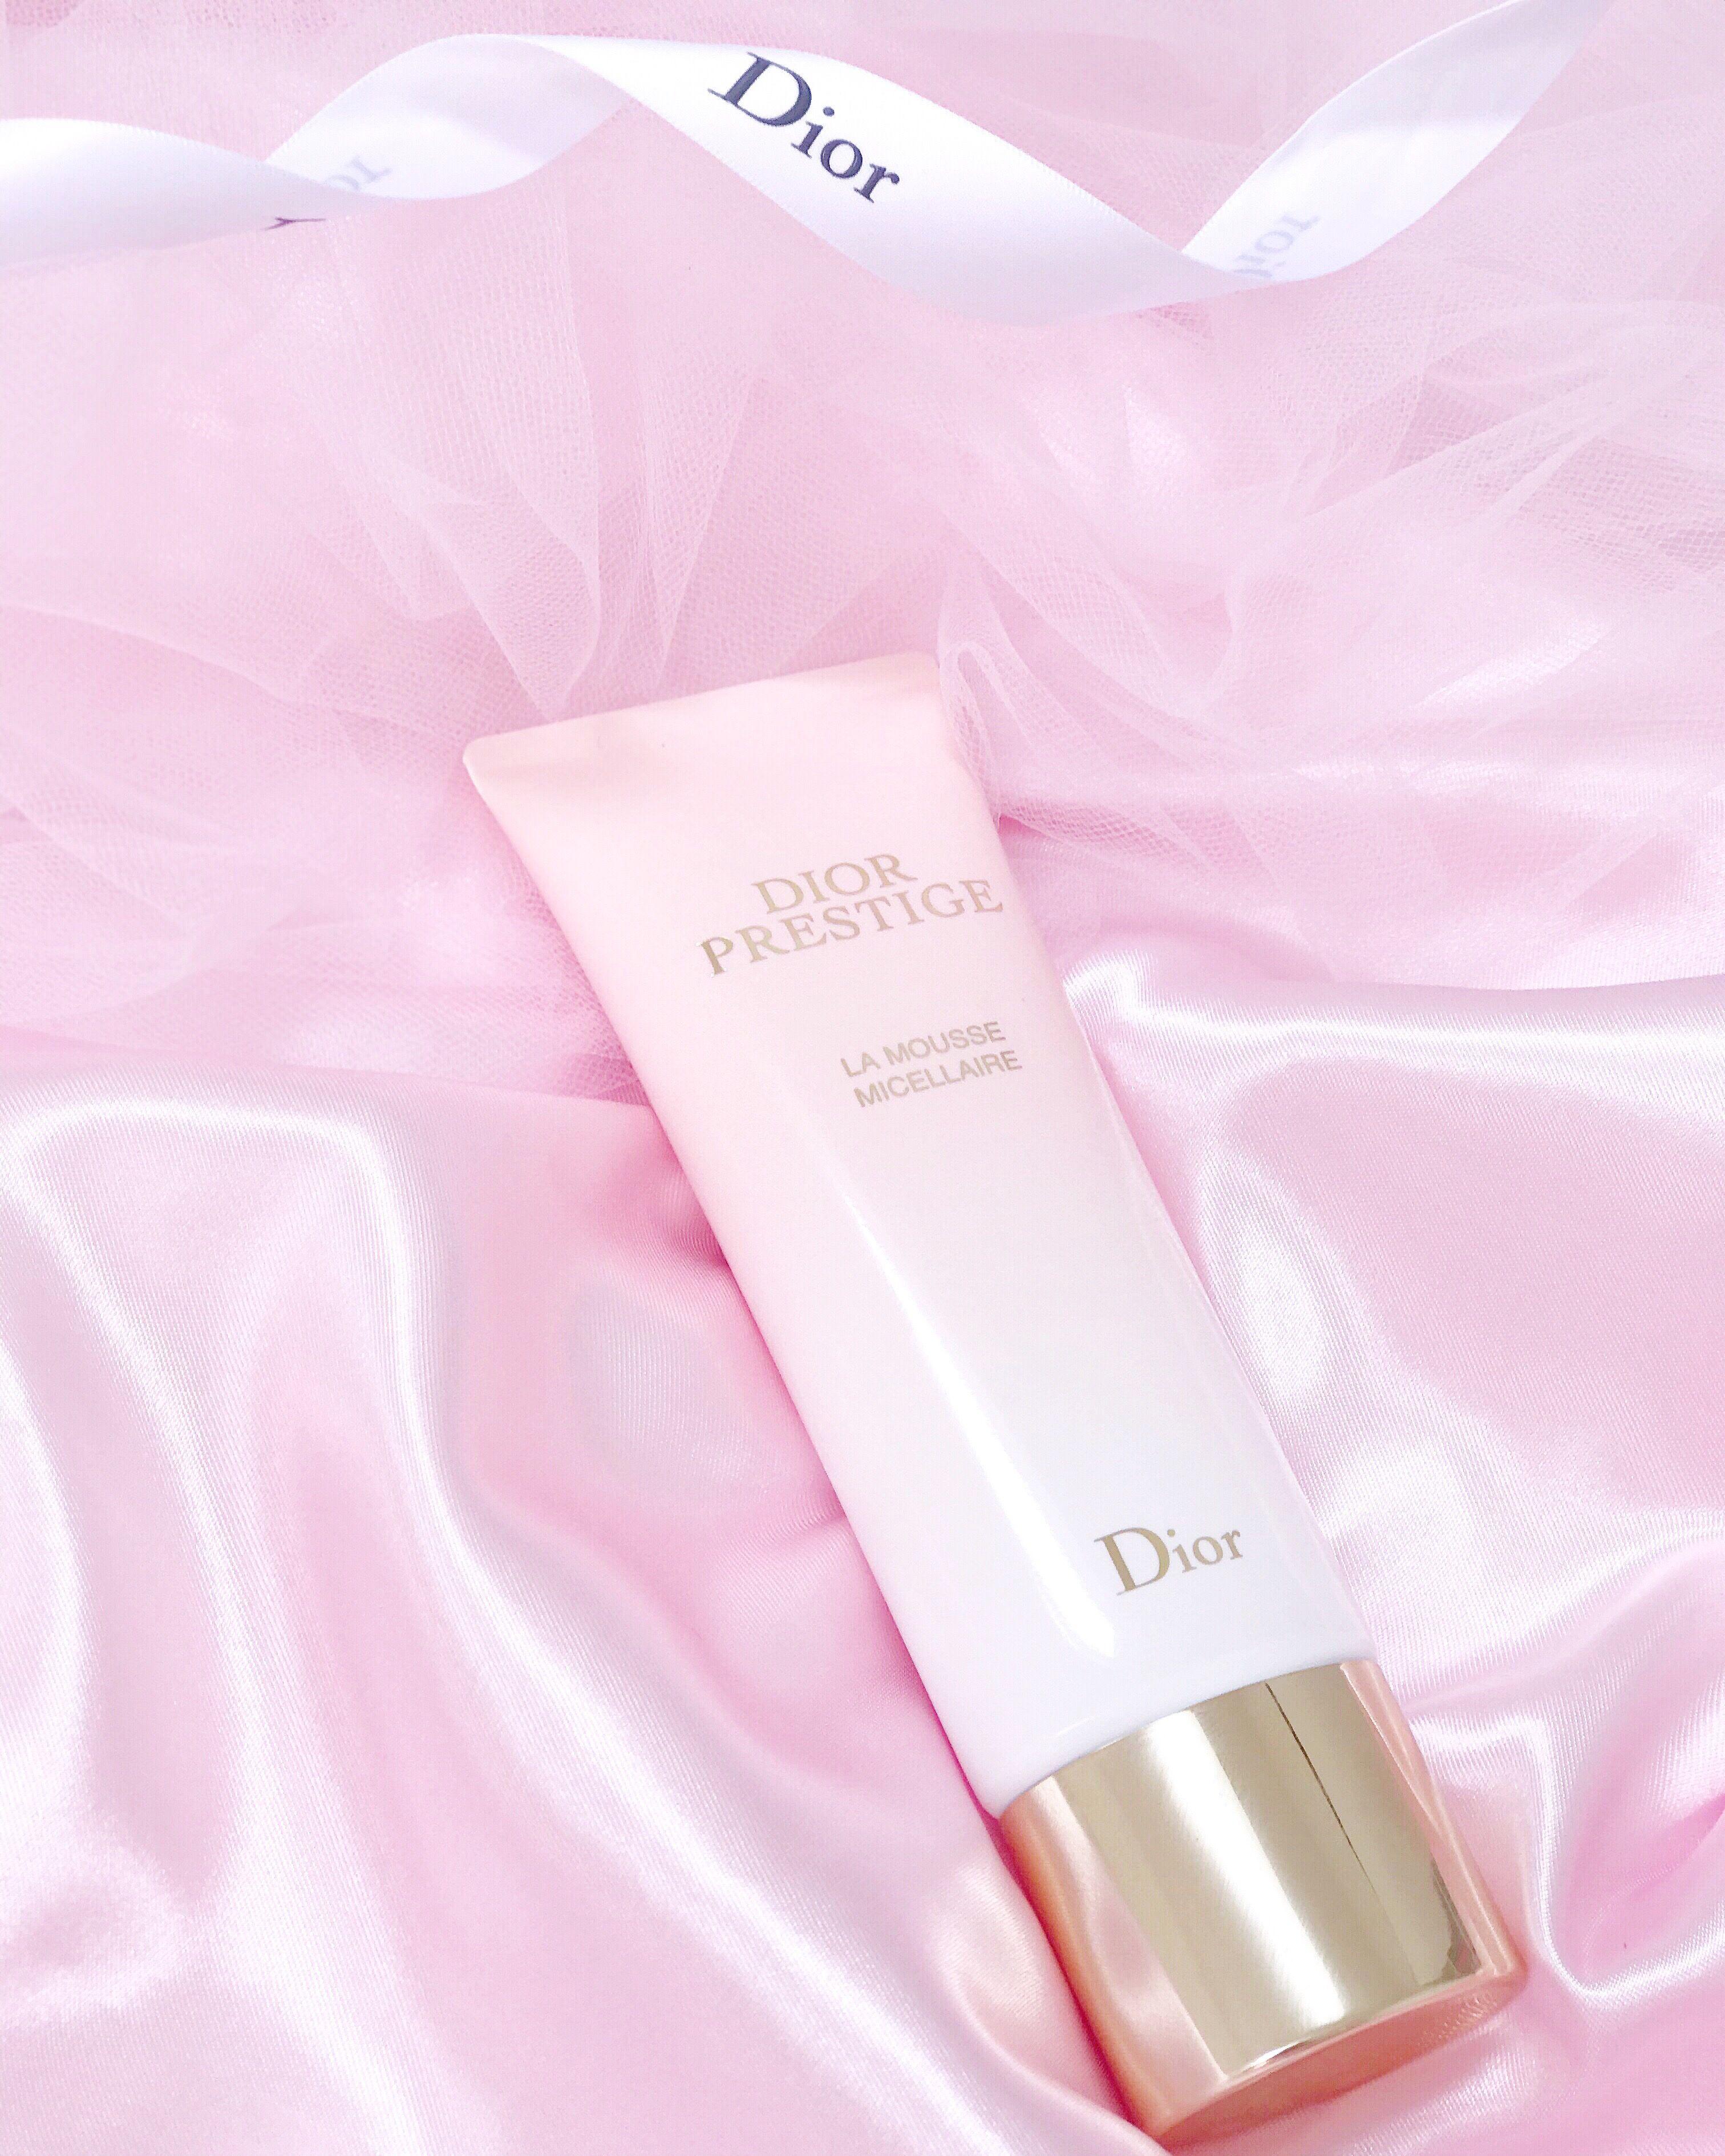 Oh So Heavenly Rose Petal Skin New Dior Prestige La Mousse Micellaire Rose Petals Aesthetic Beauty Makeup